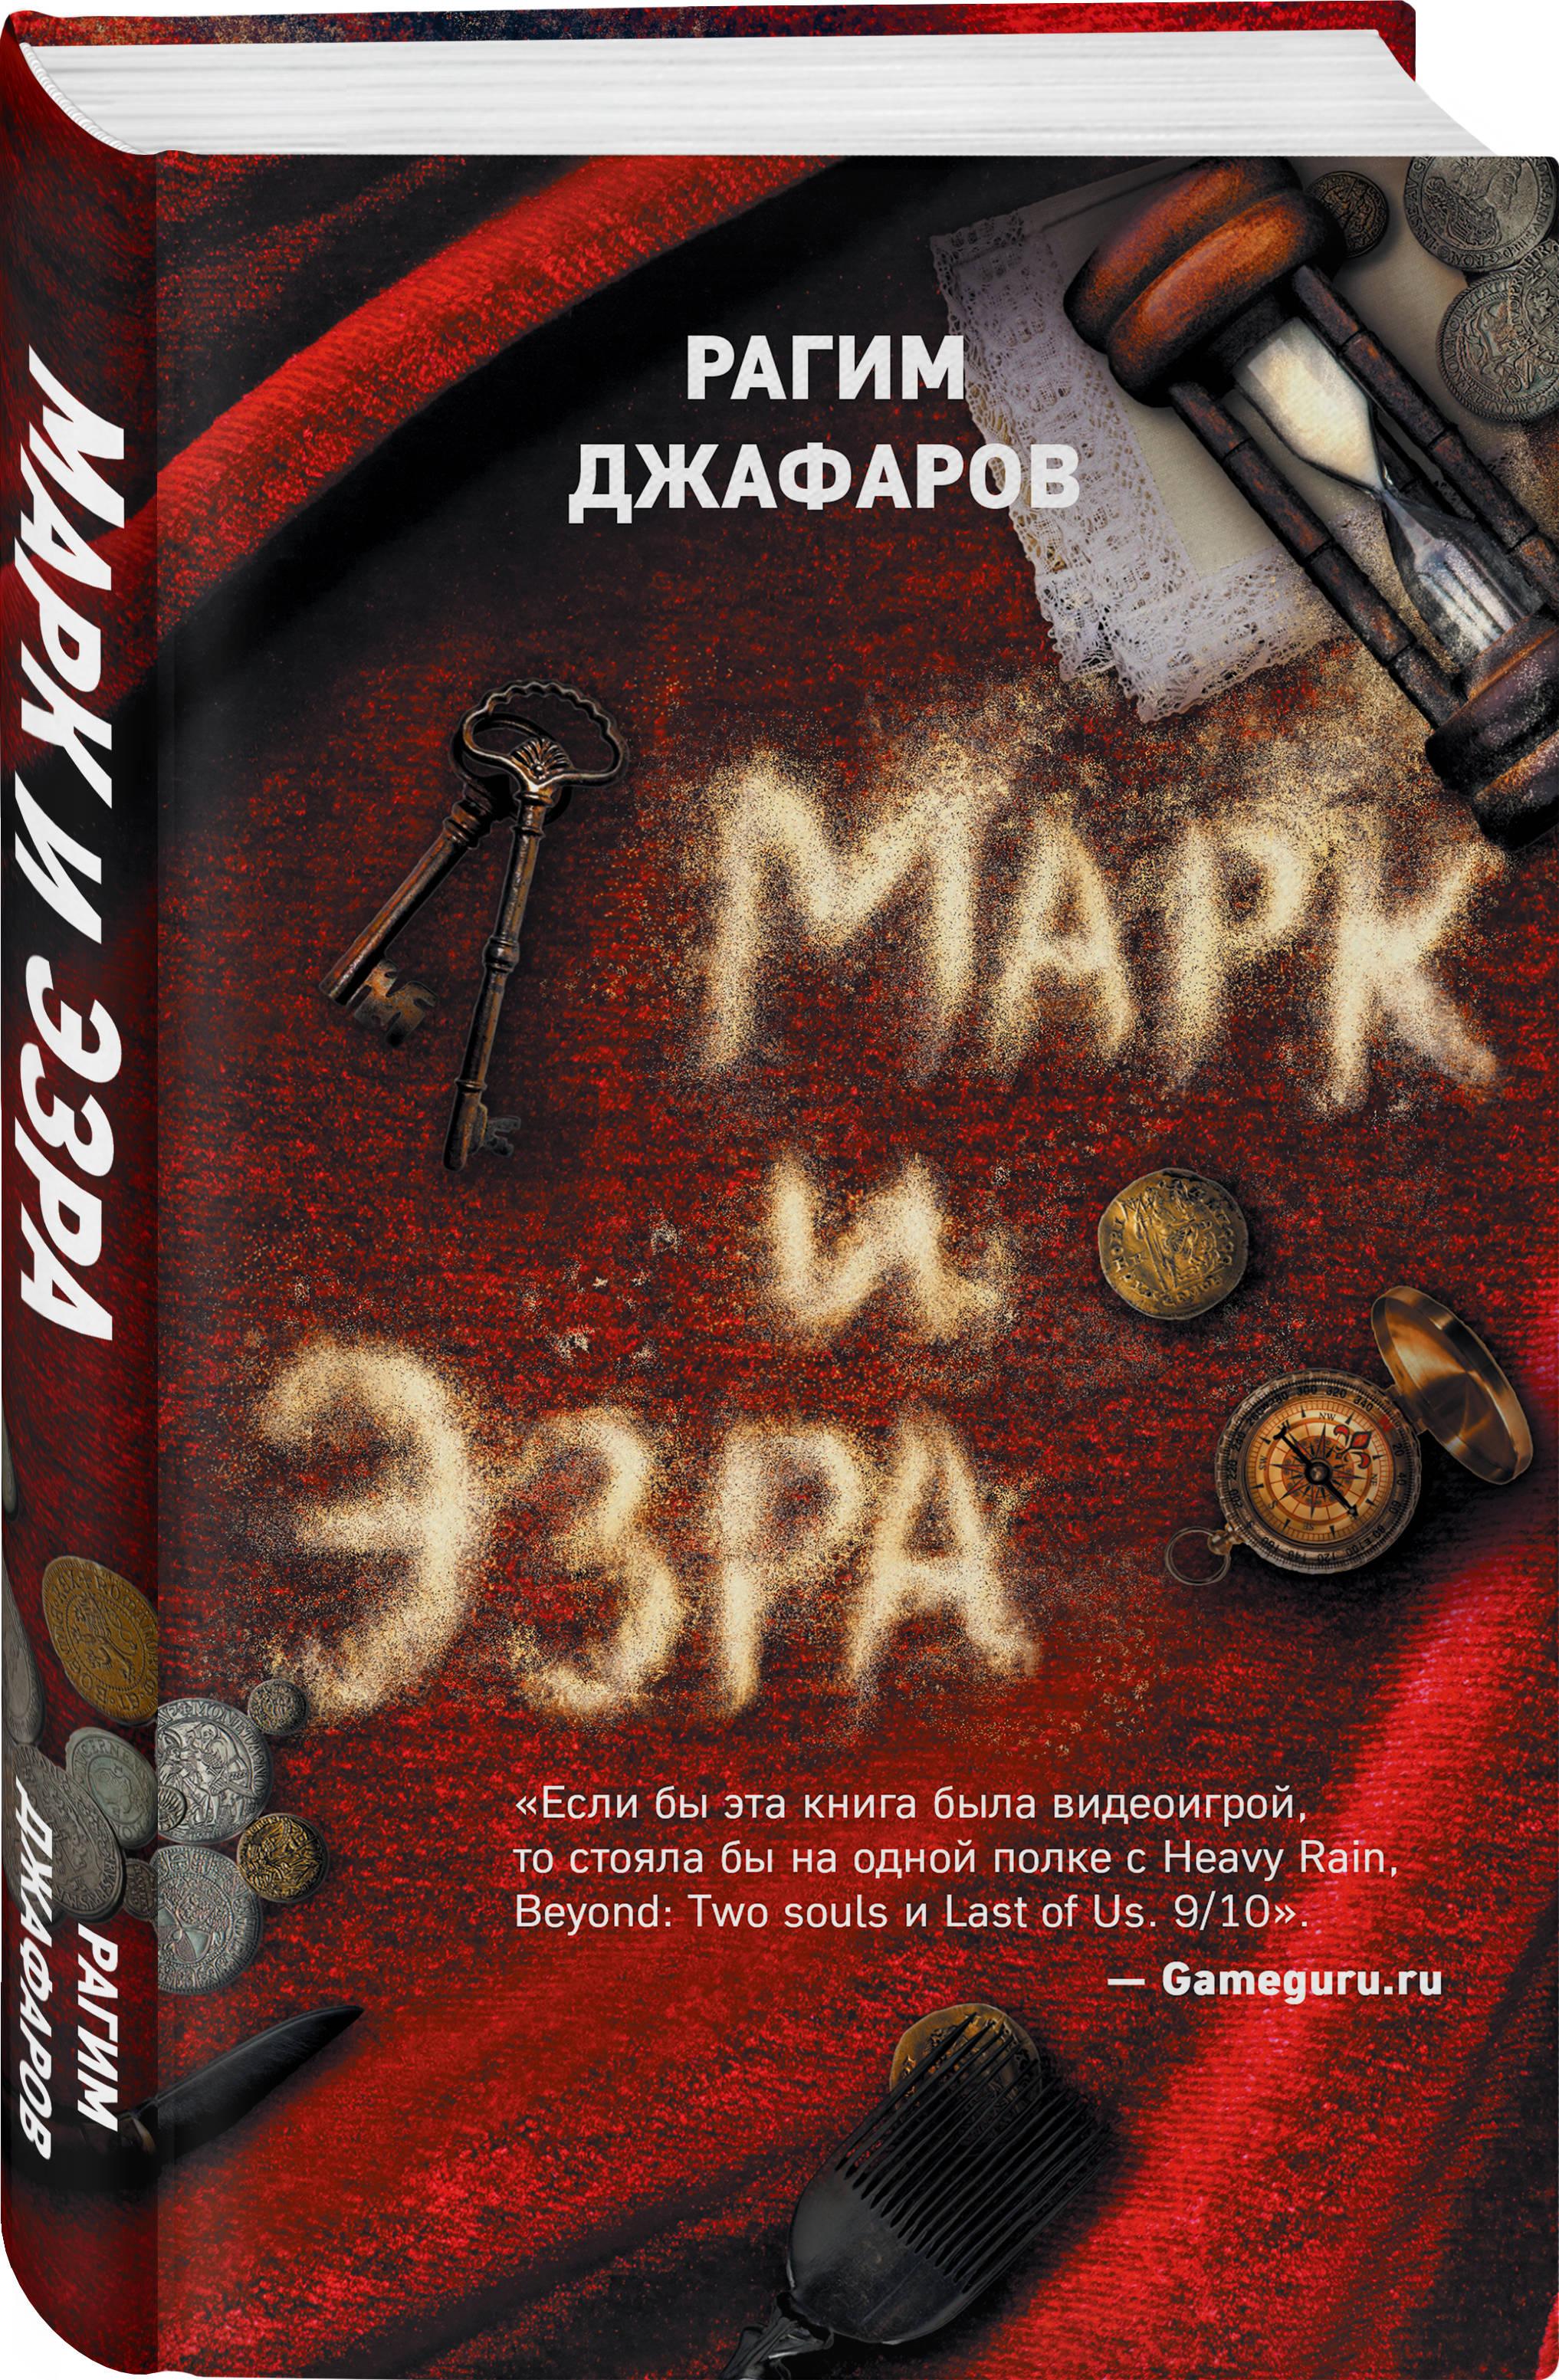 Рагим Джафаров Марк и Эзра алкотестер марк 5 цена